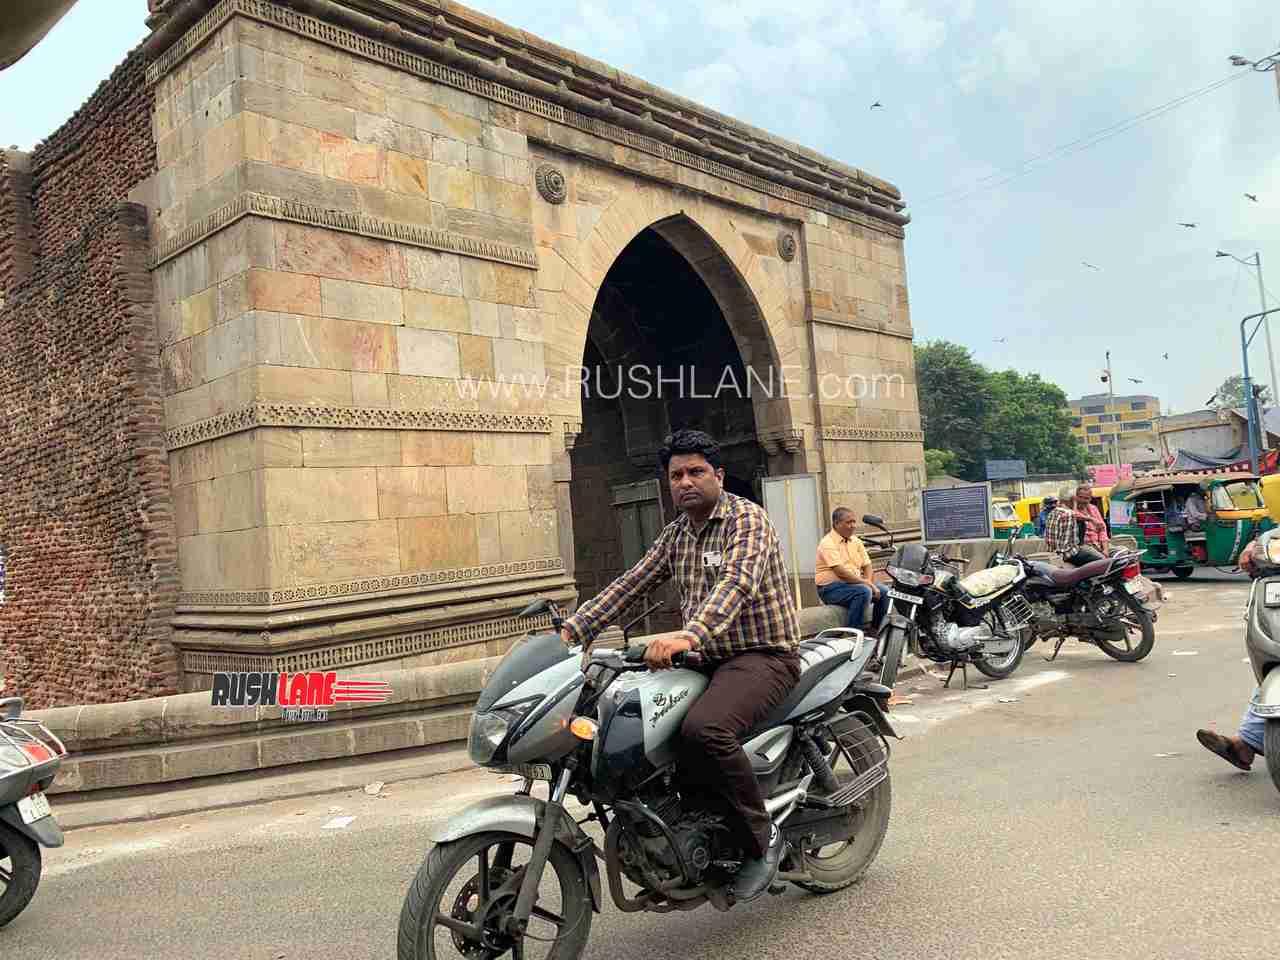 Bajaj pulsar ahmedabad biker helmet